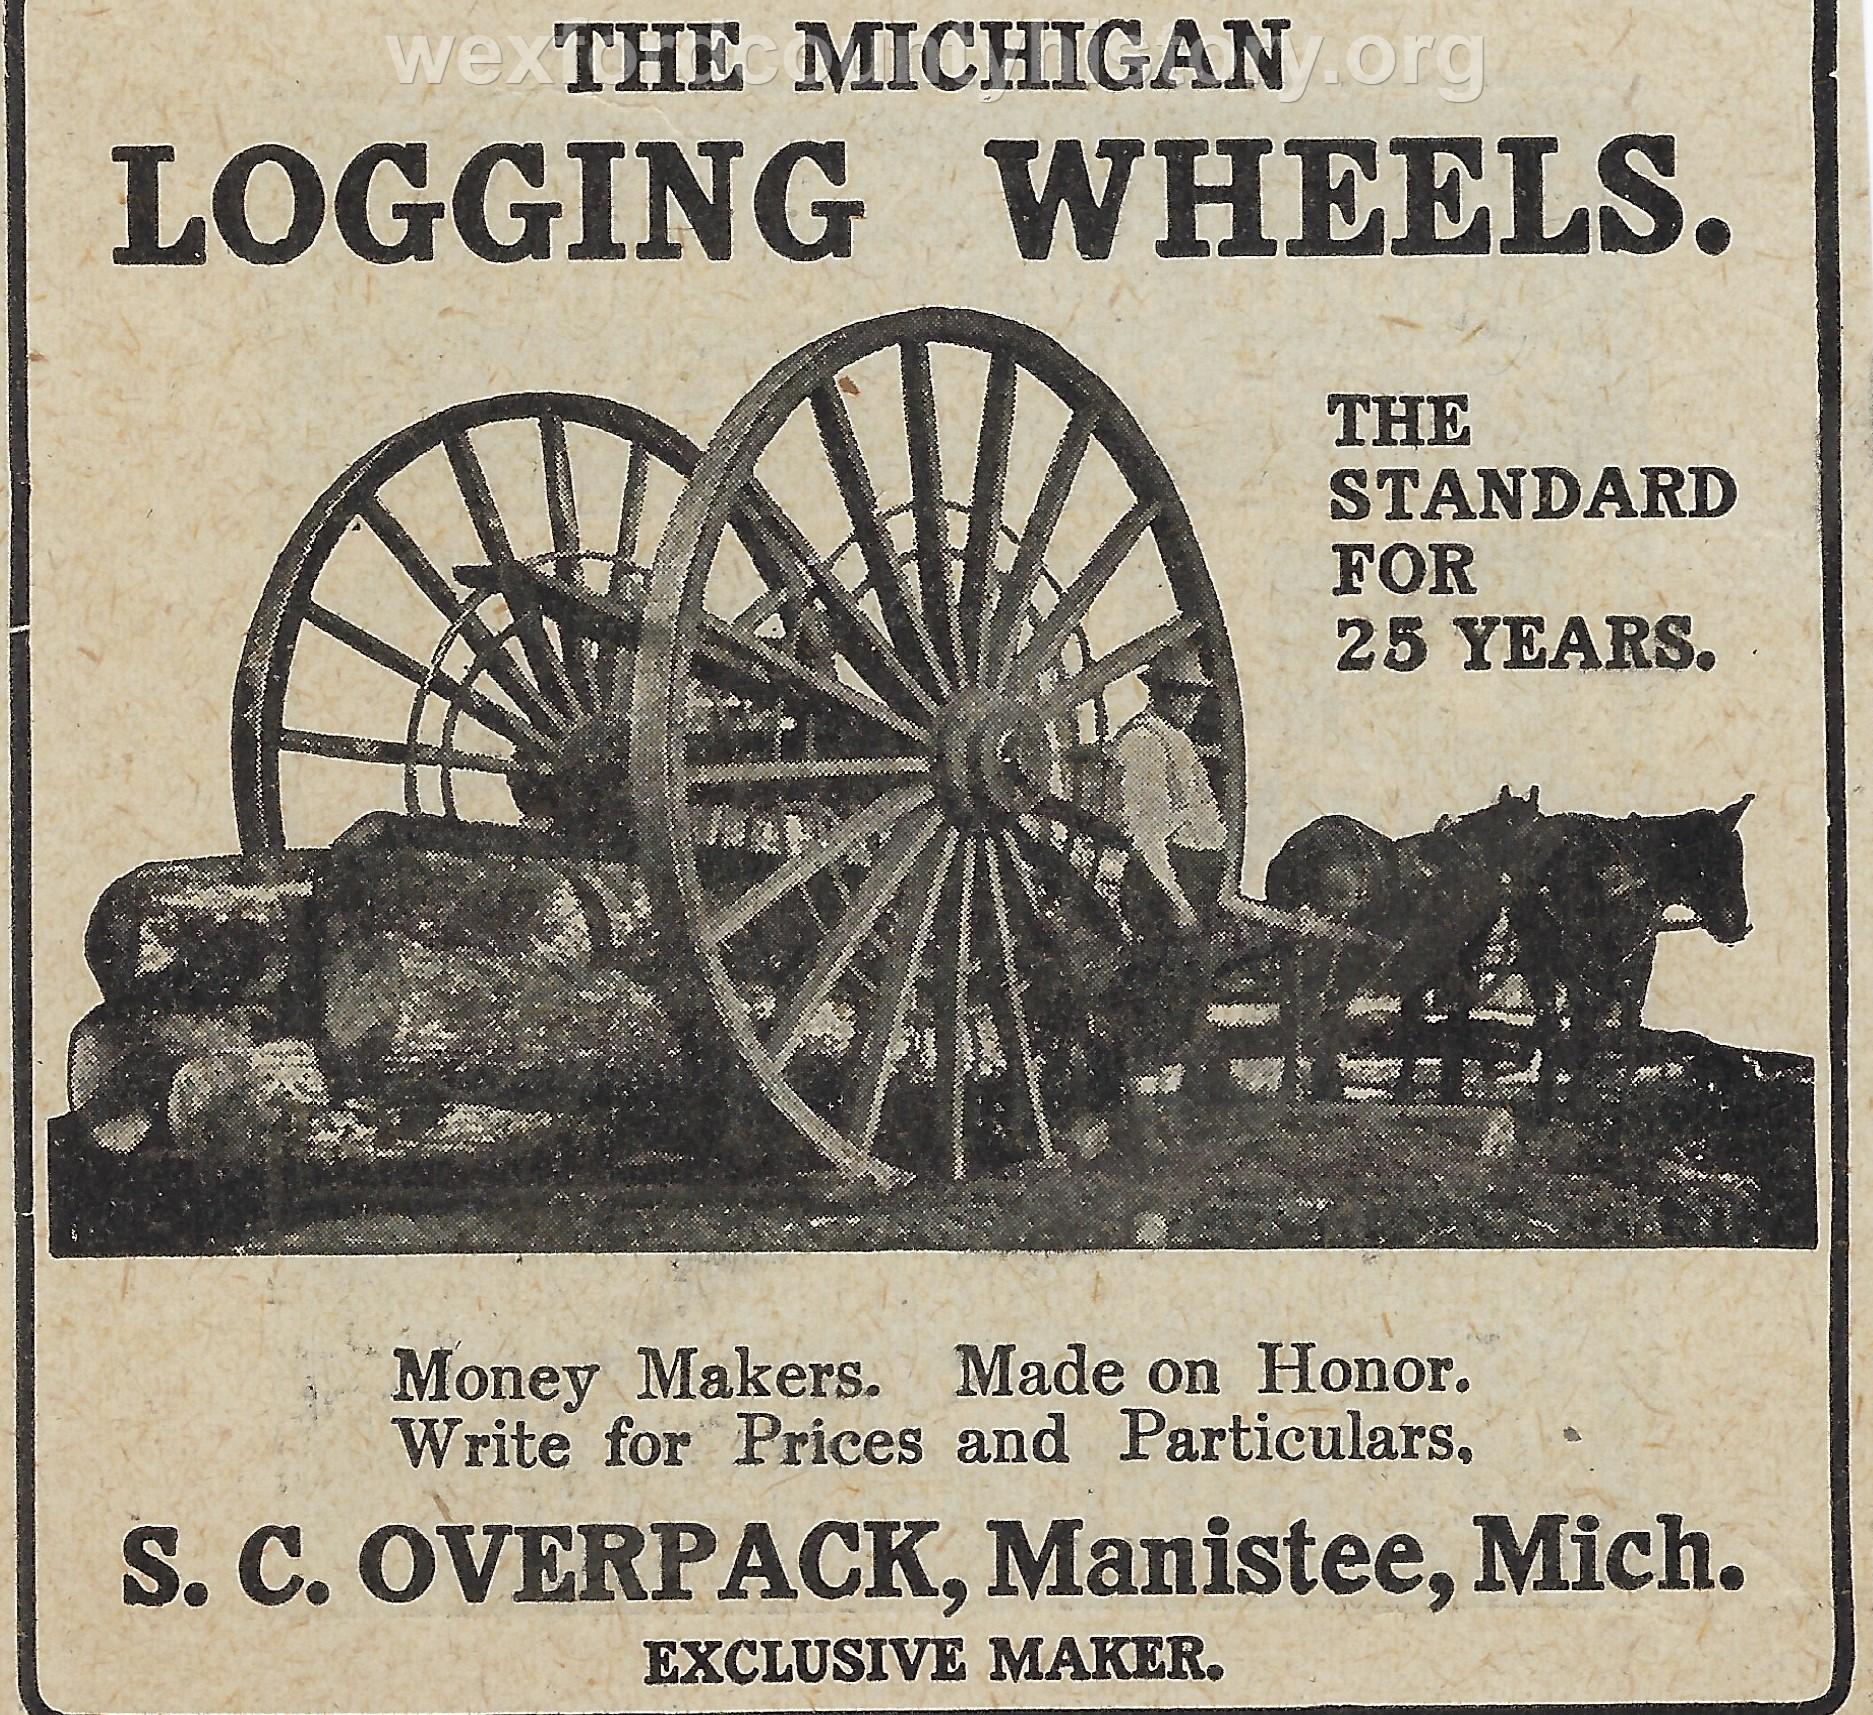 Cadillac-Lumber-Michigan-Logging-Wheels-1